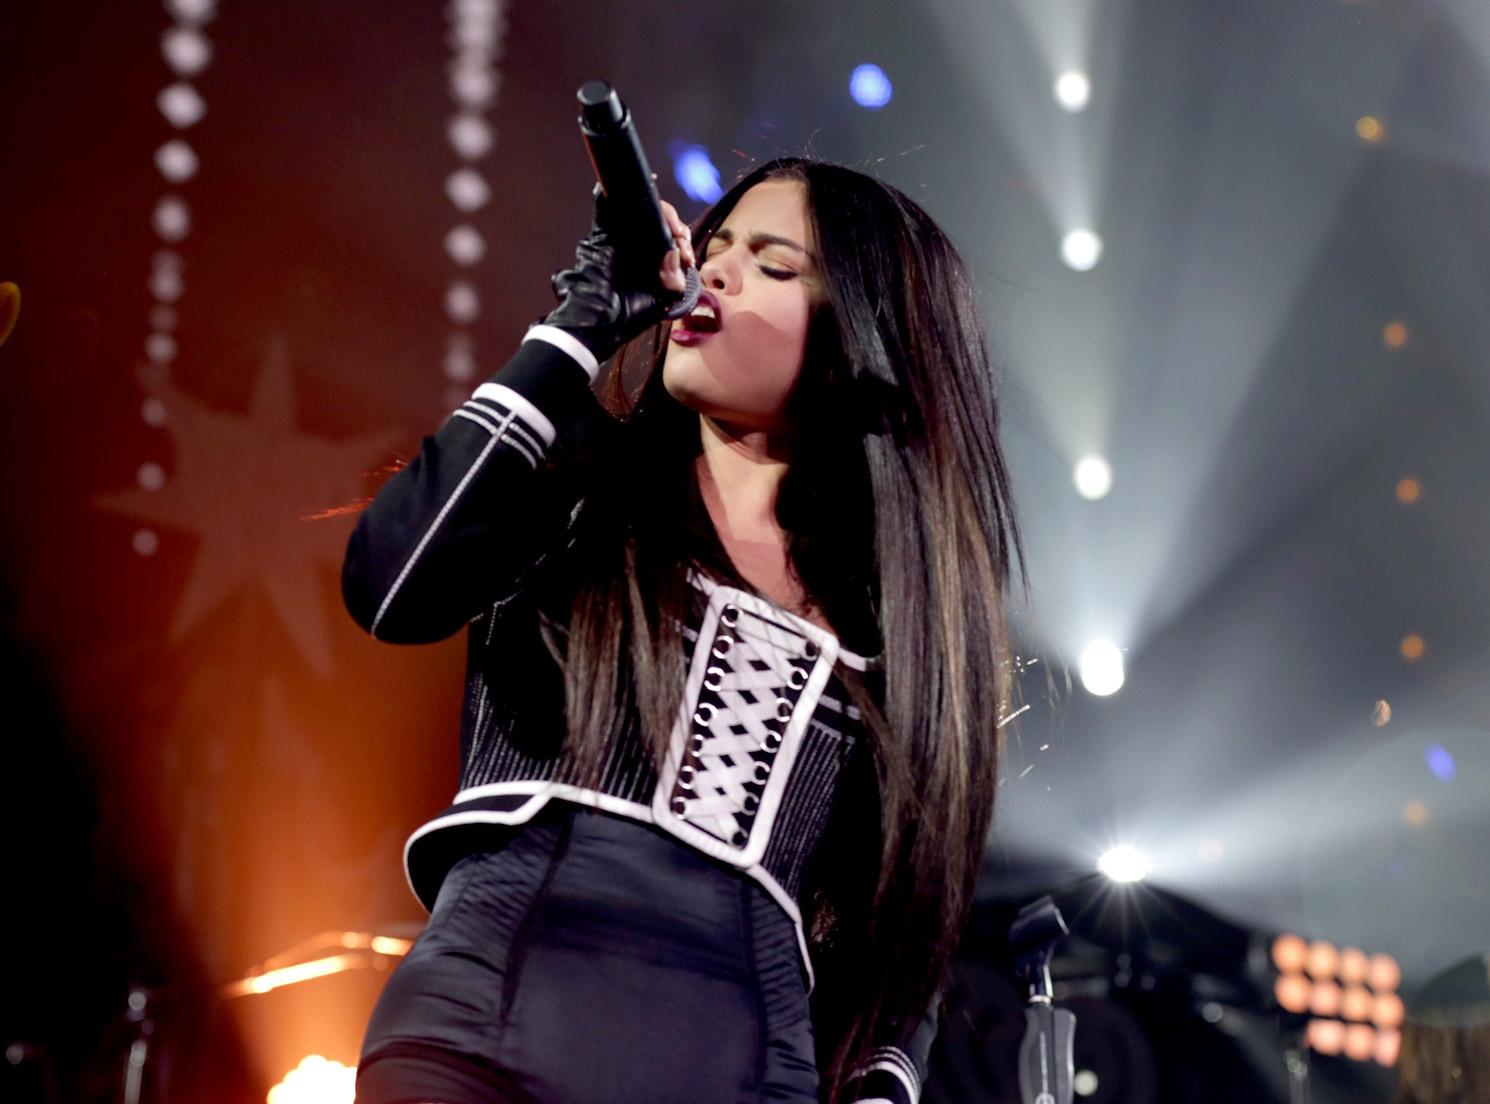 Buy Gomez selena singing pictures trends